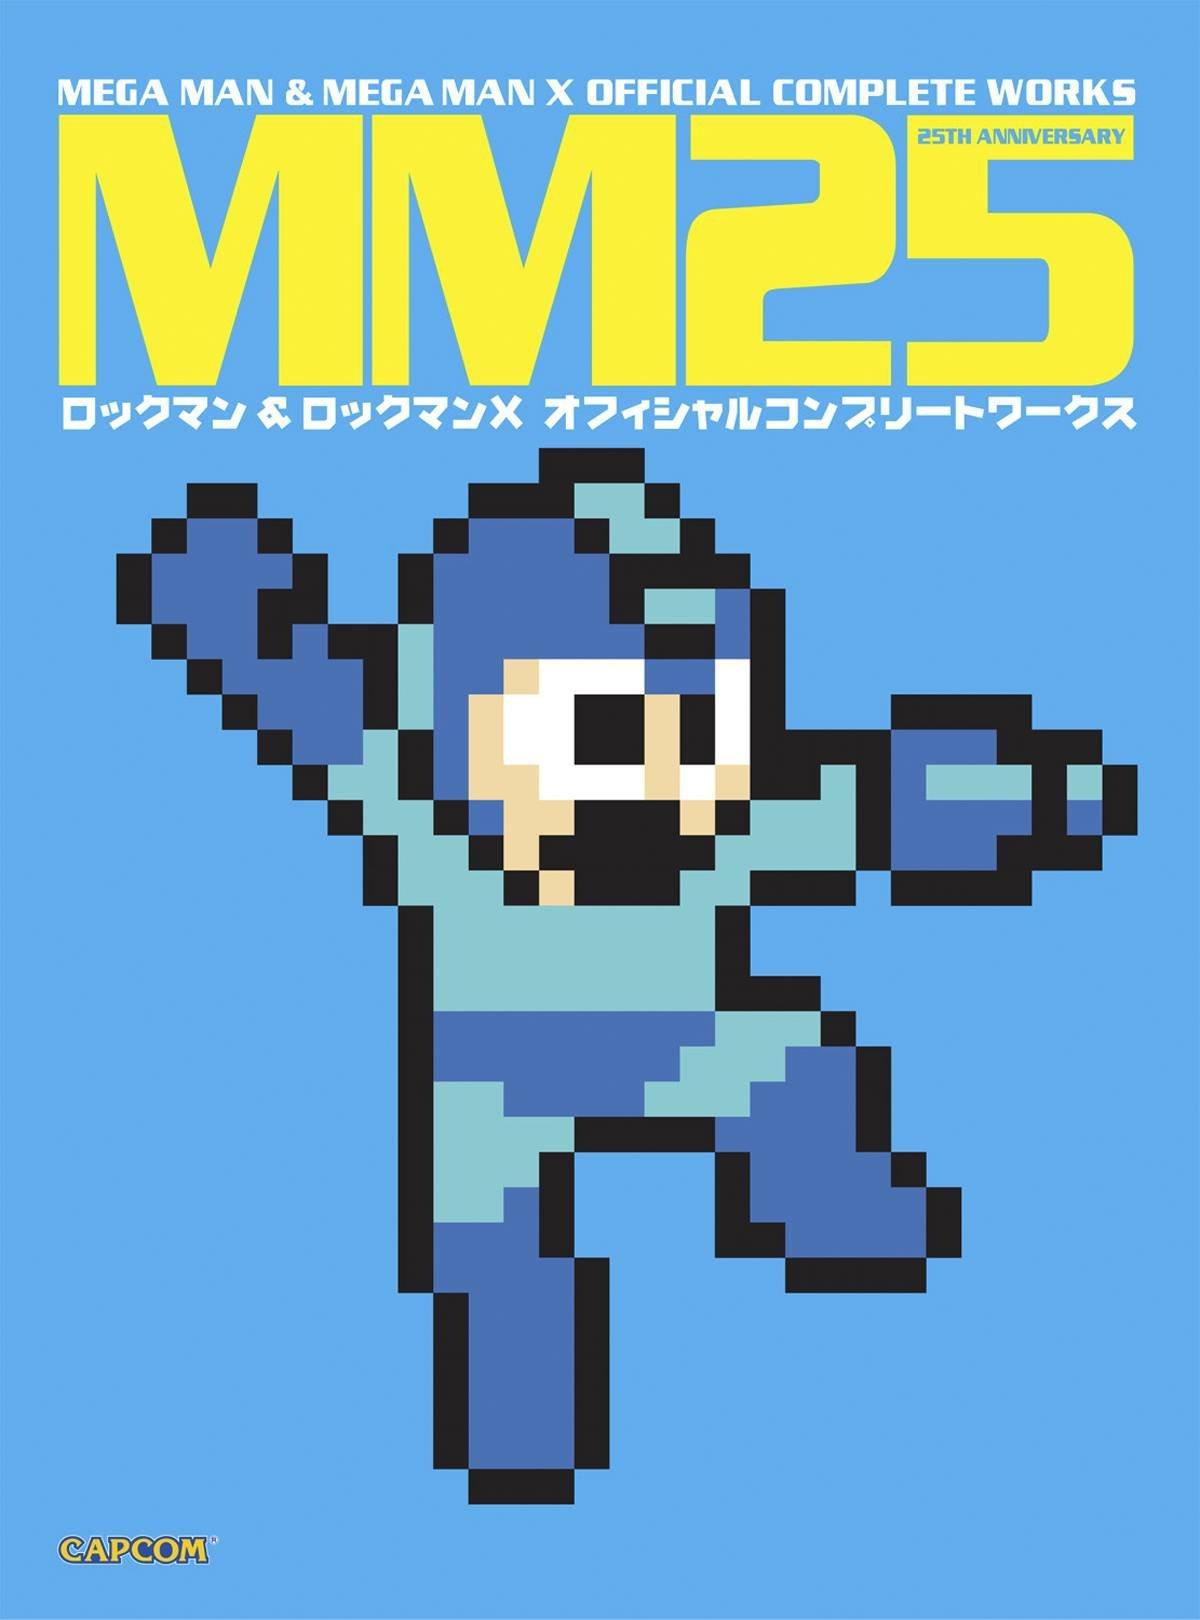 mm25 mega man mega man x official complete works capcom keiji